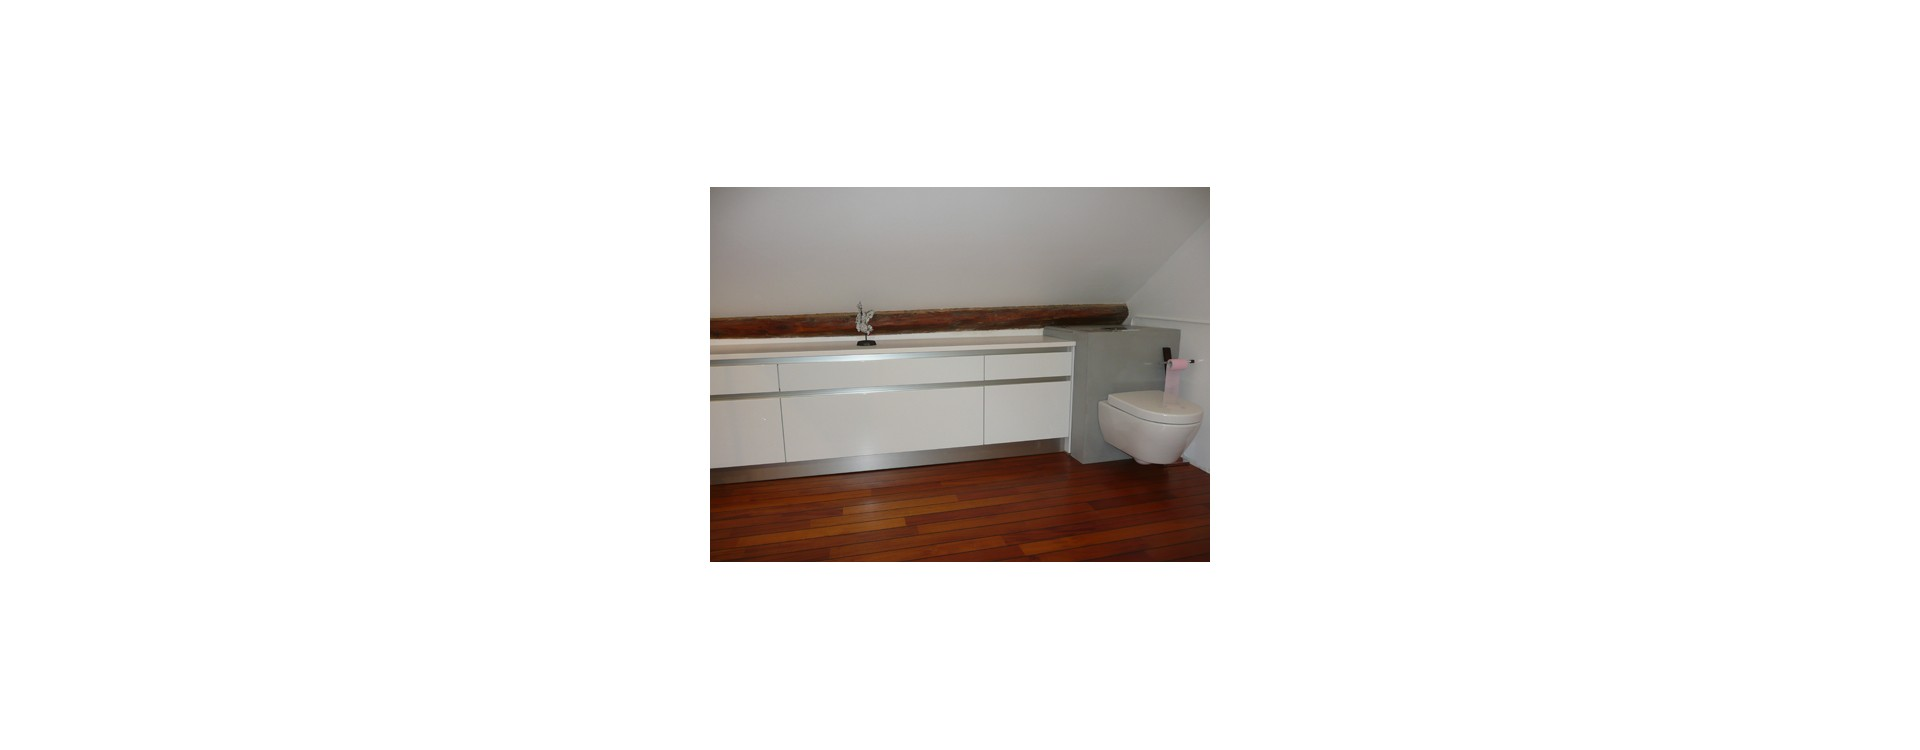 baignoire neo jacob delafon et cabine douche circulaire. Black Bedroom Furniture Sets. Home Design Ideas